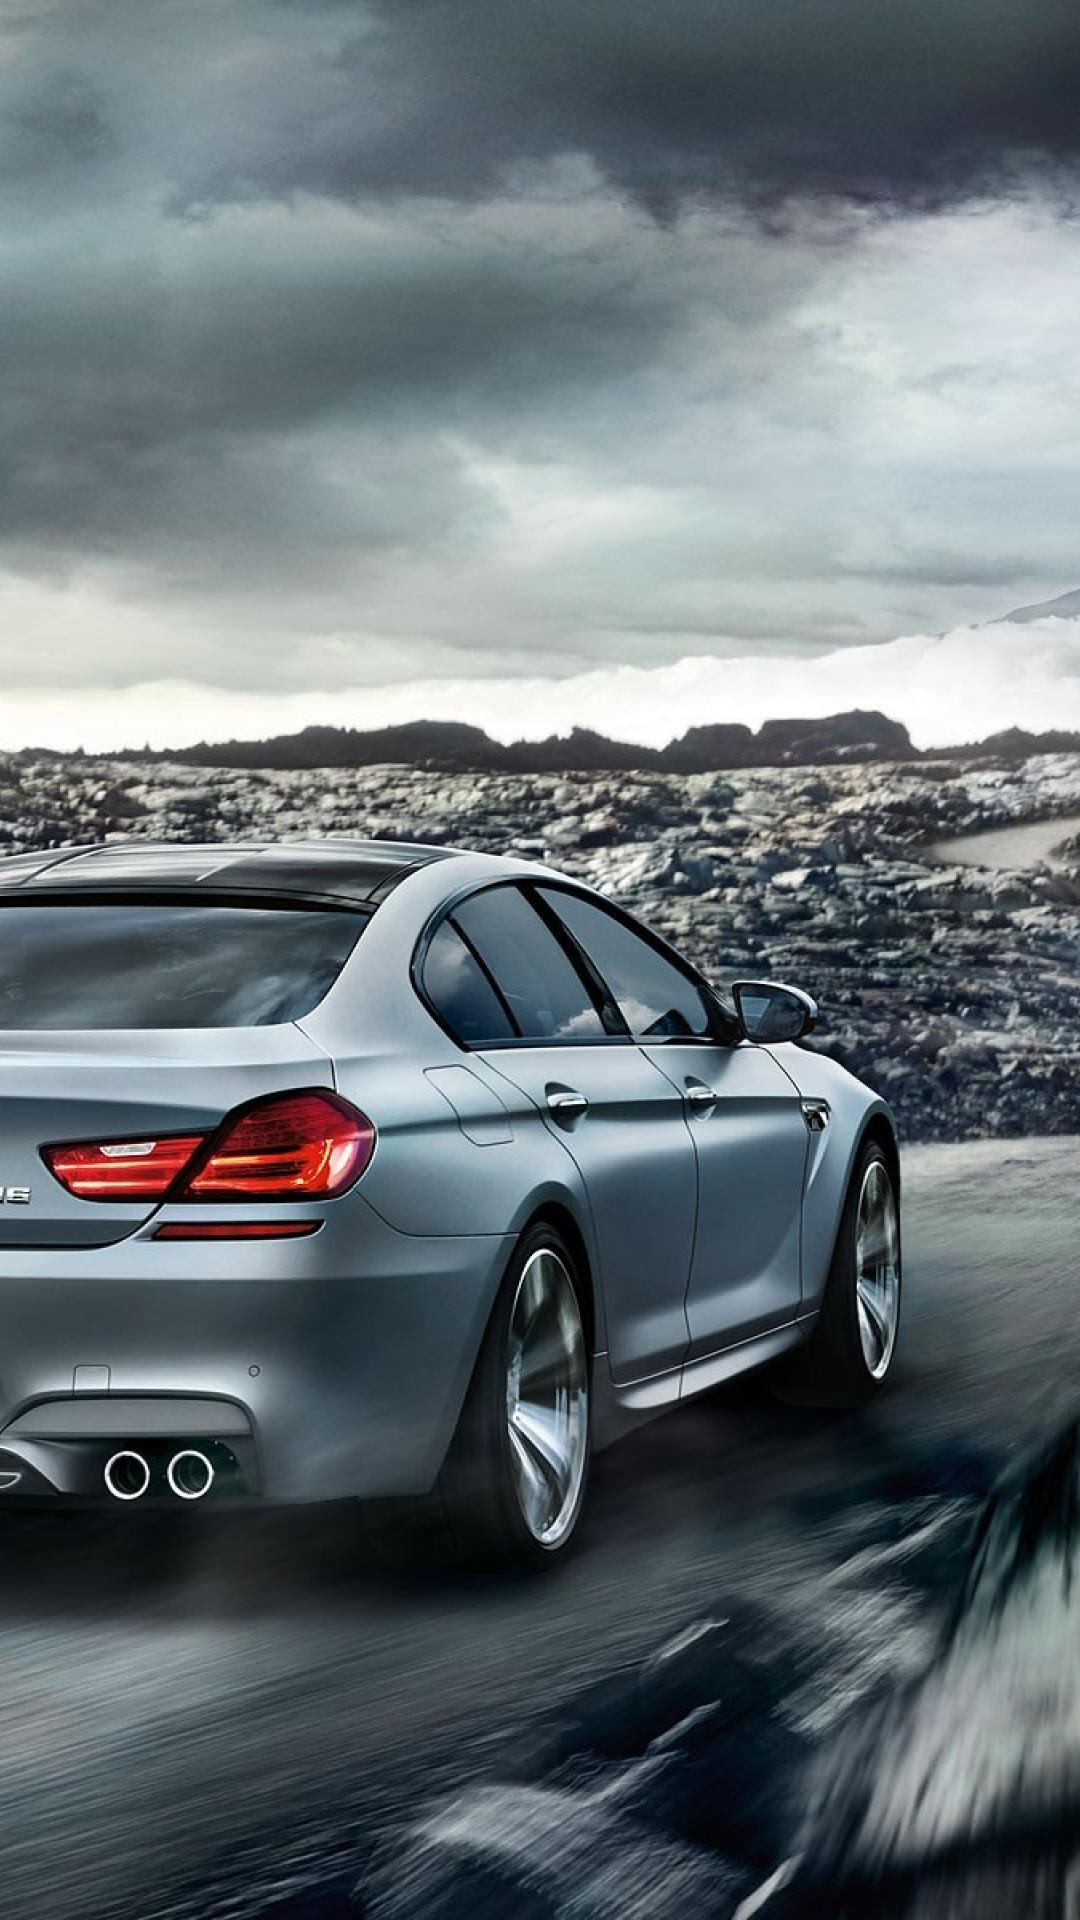 Gran coupe BMW M6  Htc one wallpaper